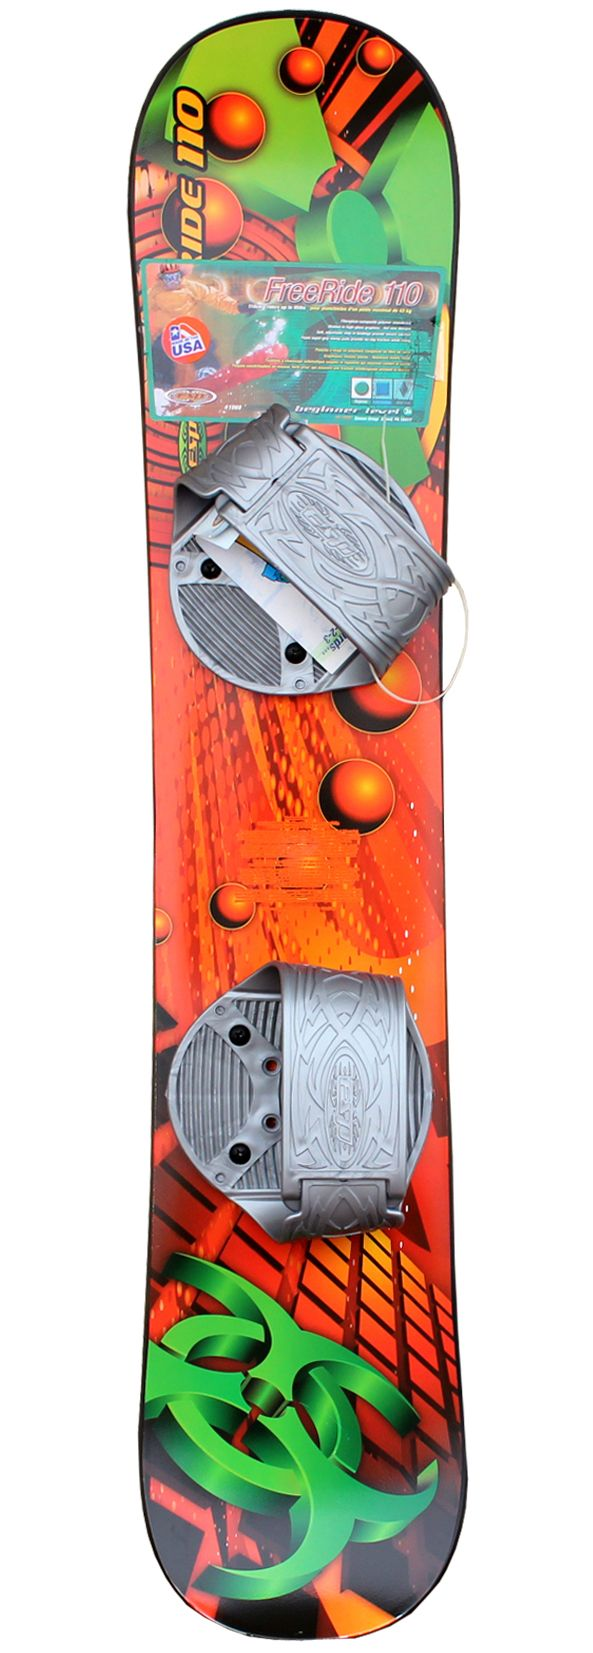 Emsco Freeride Snowboard - 110cm